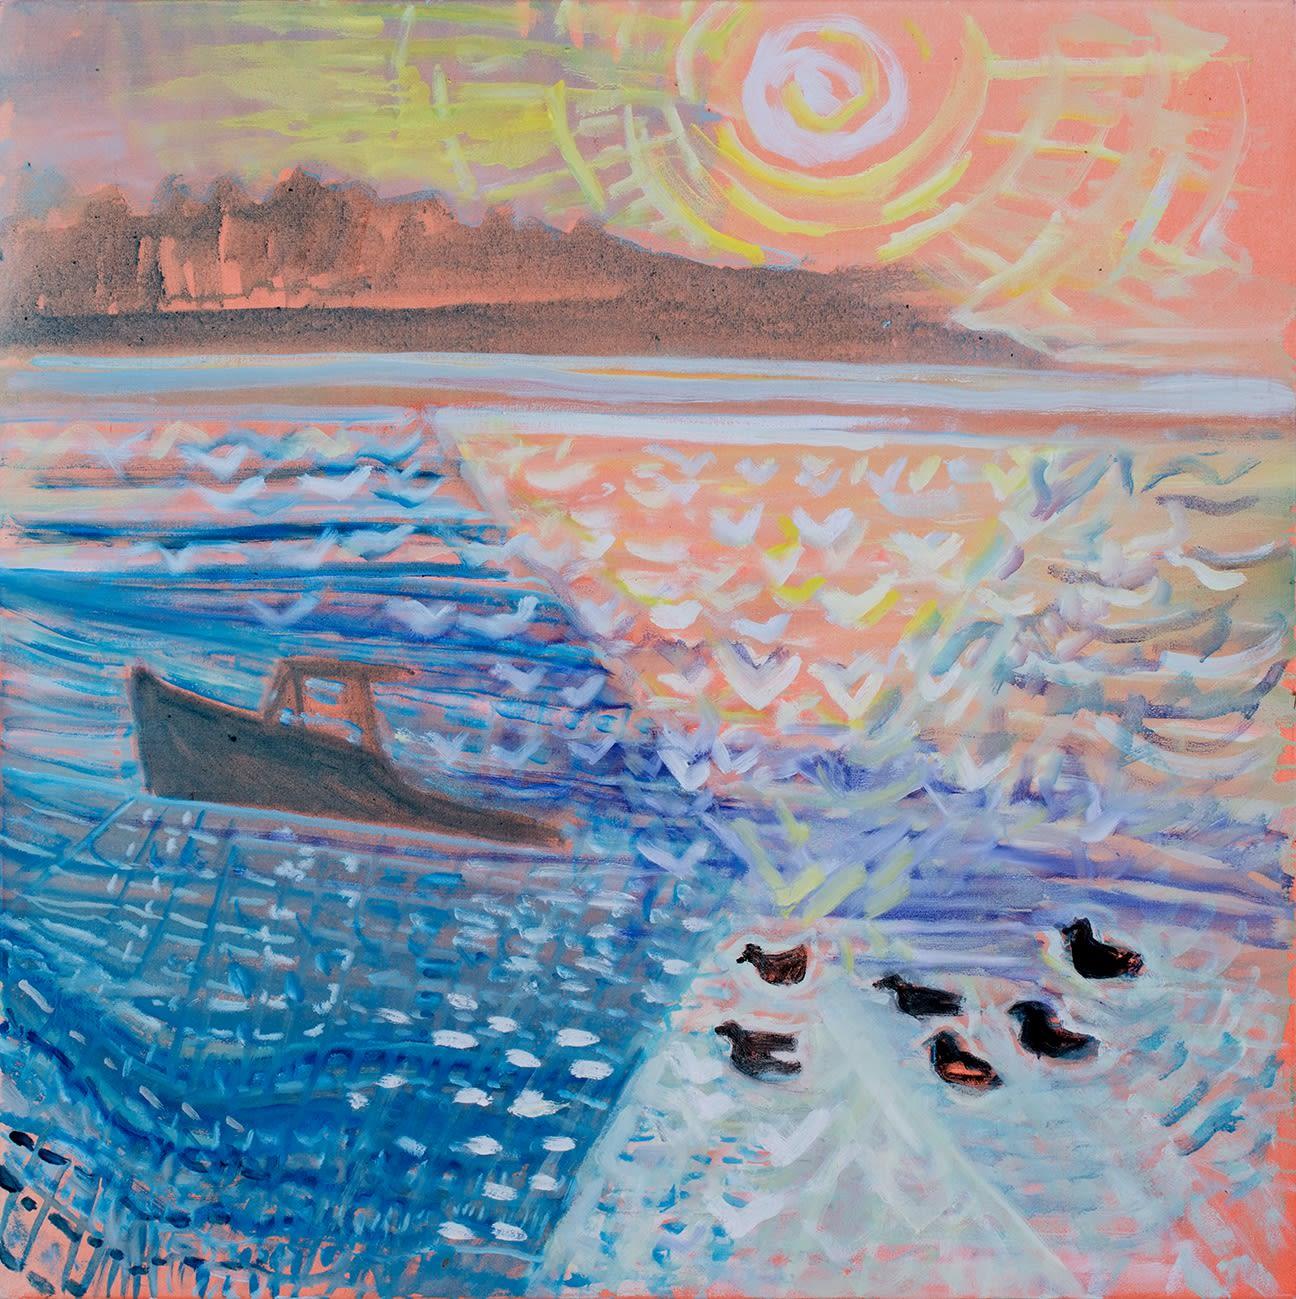 Brita Holmquist: Overhomer - Paintings from Around the Bay